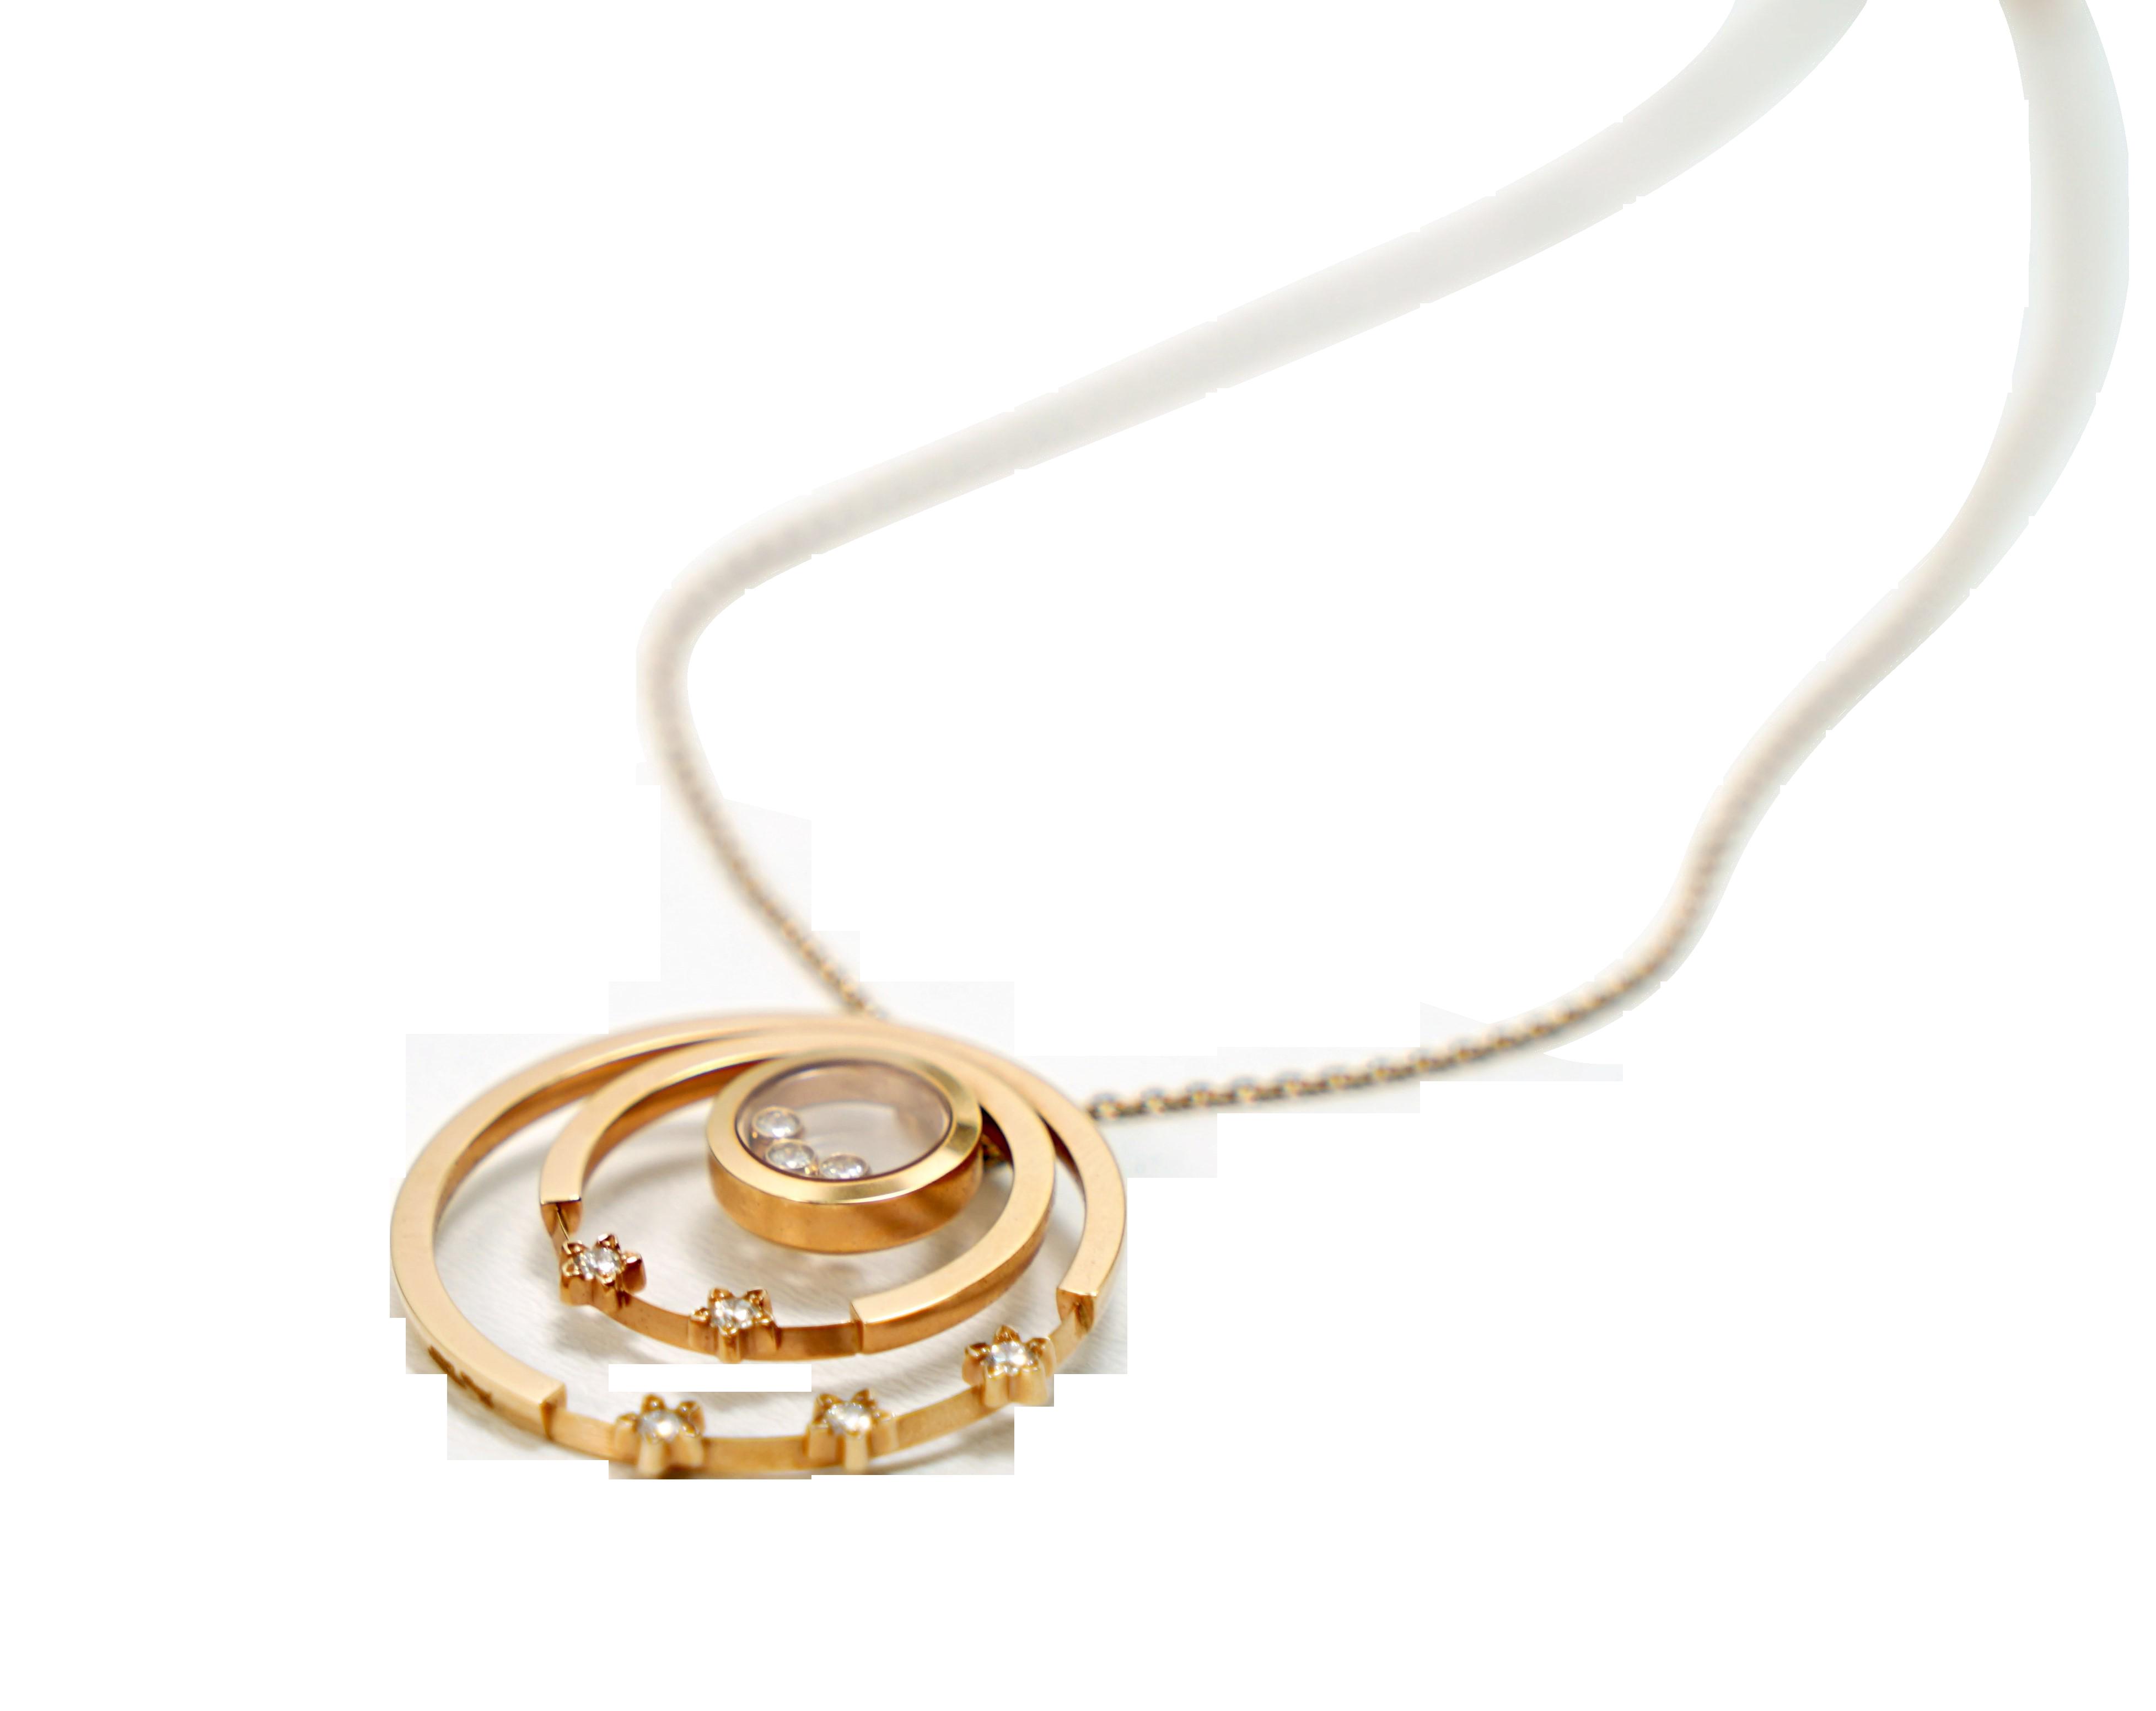 A Lady's Chopard 18K Rose Gold , Happy Diamonds pendant - Image 5 of 9